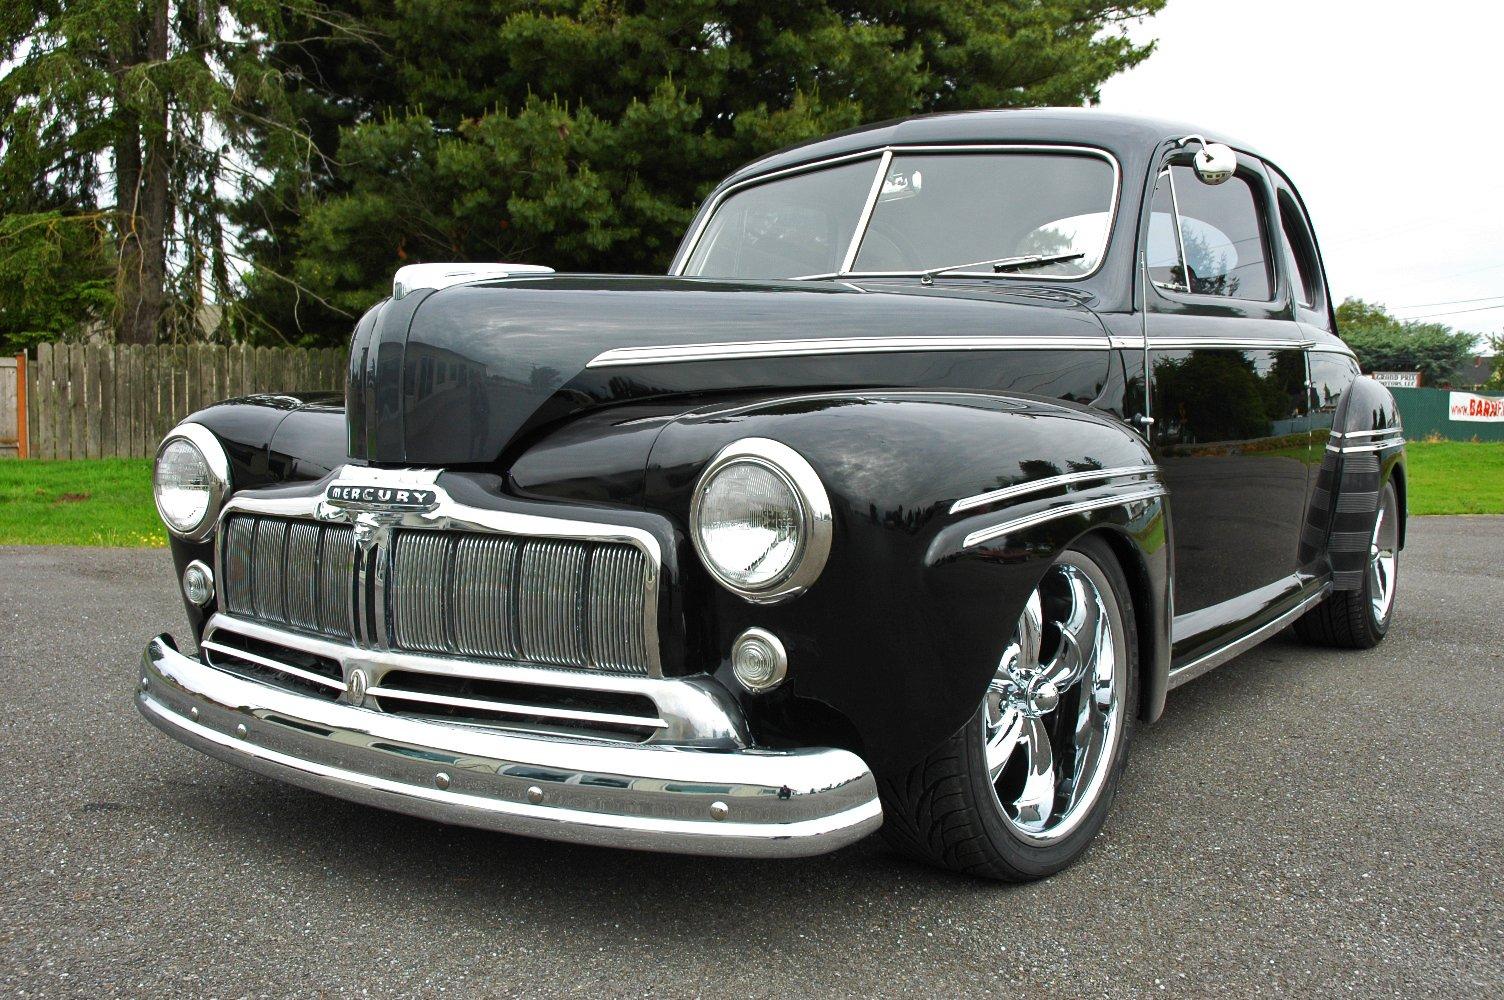 Mercury Hd Wallpaper 1947 Mercury Eight Coupe Hotrod Streetrod Hot Rod Street